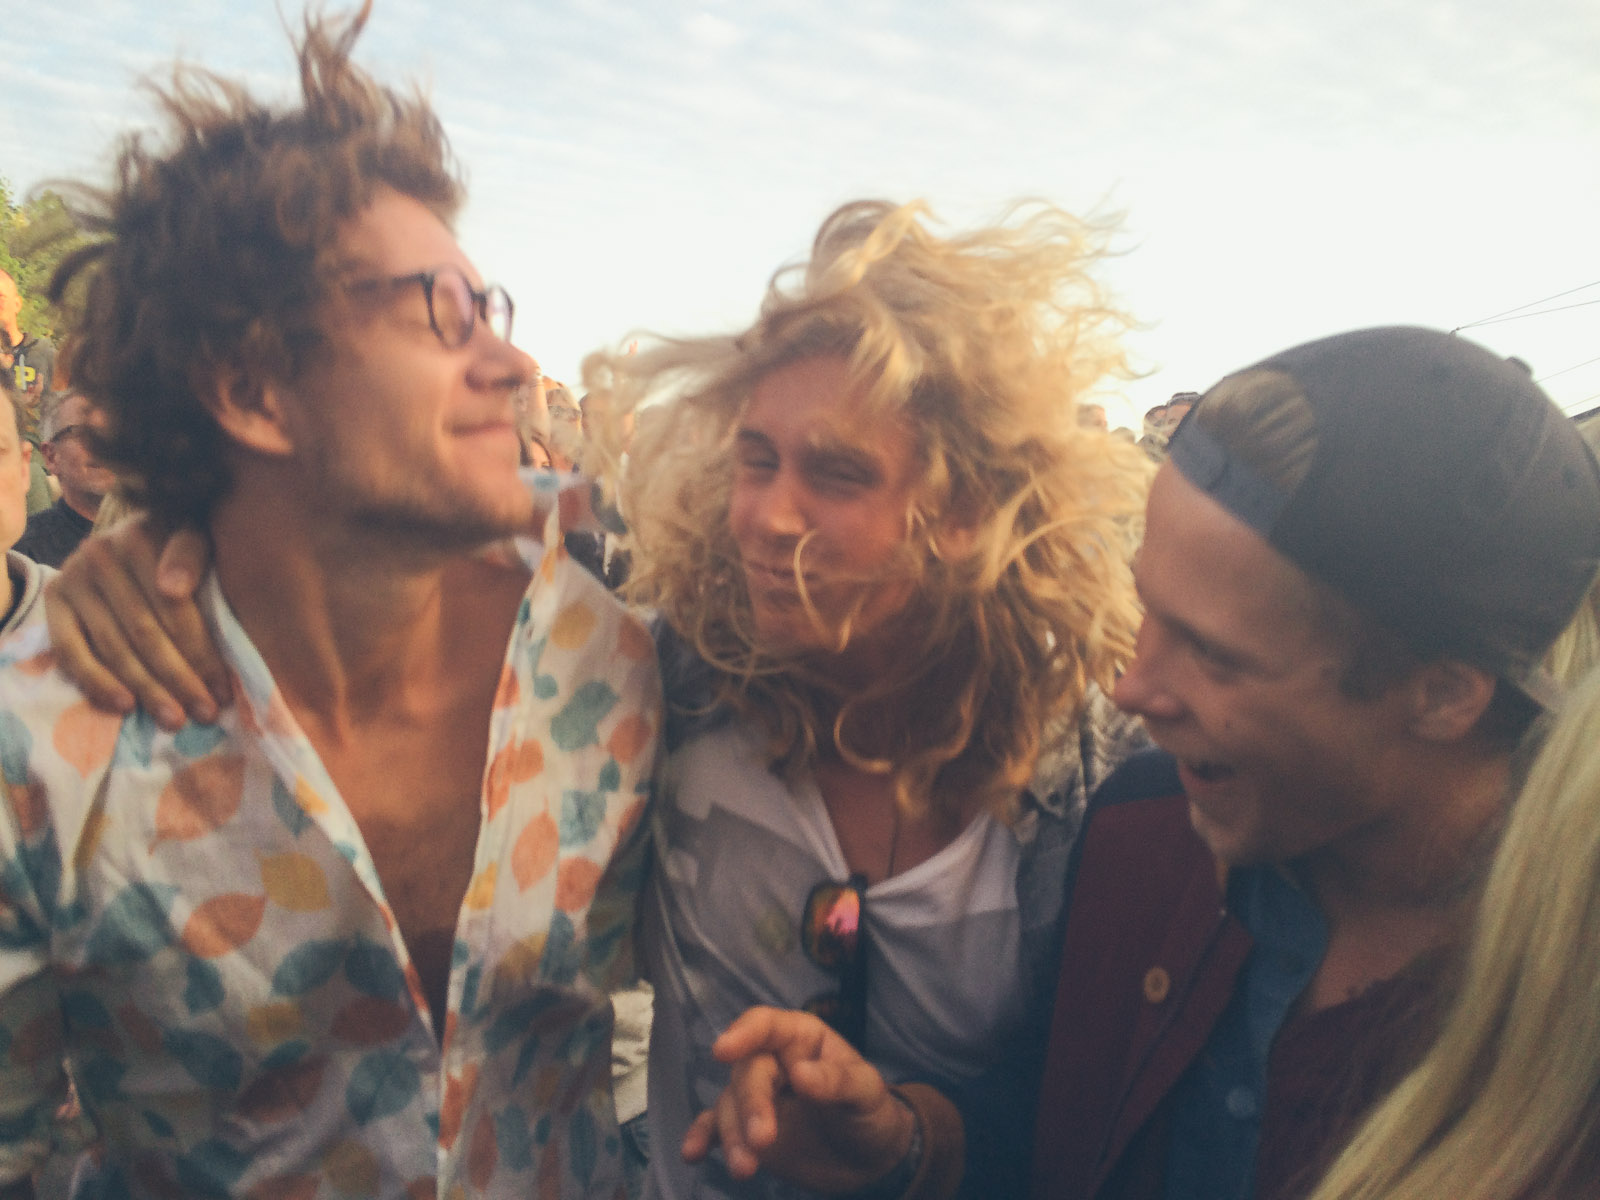 Sunshinestories-surf-travel-blog-IMG_3936